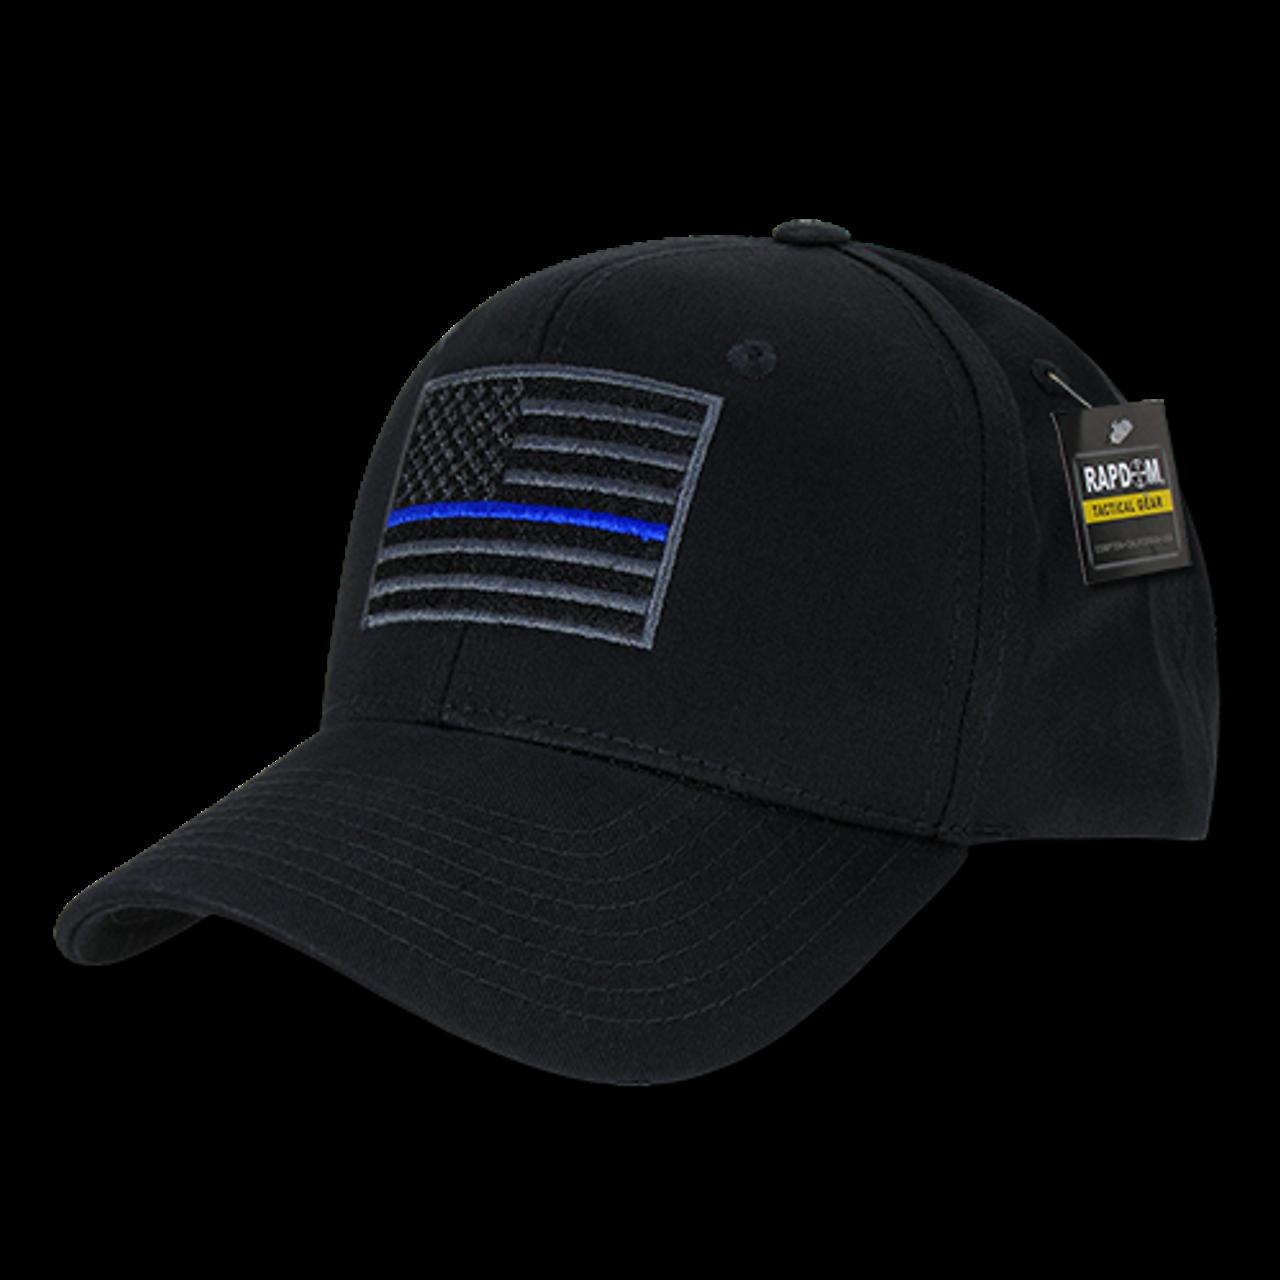 Navy USA American Flag Thin Blue Line Tactical Operator Cotton Baseball Cap Hat